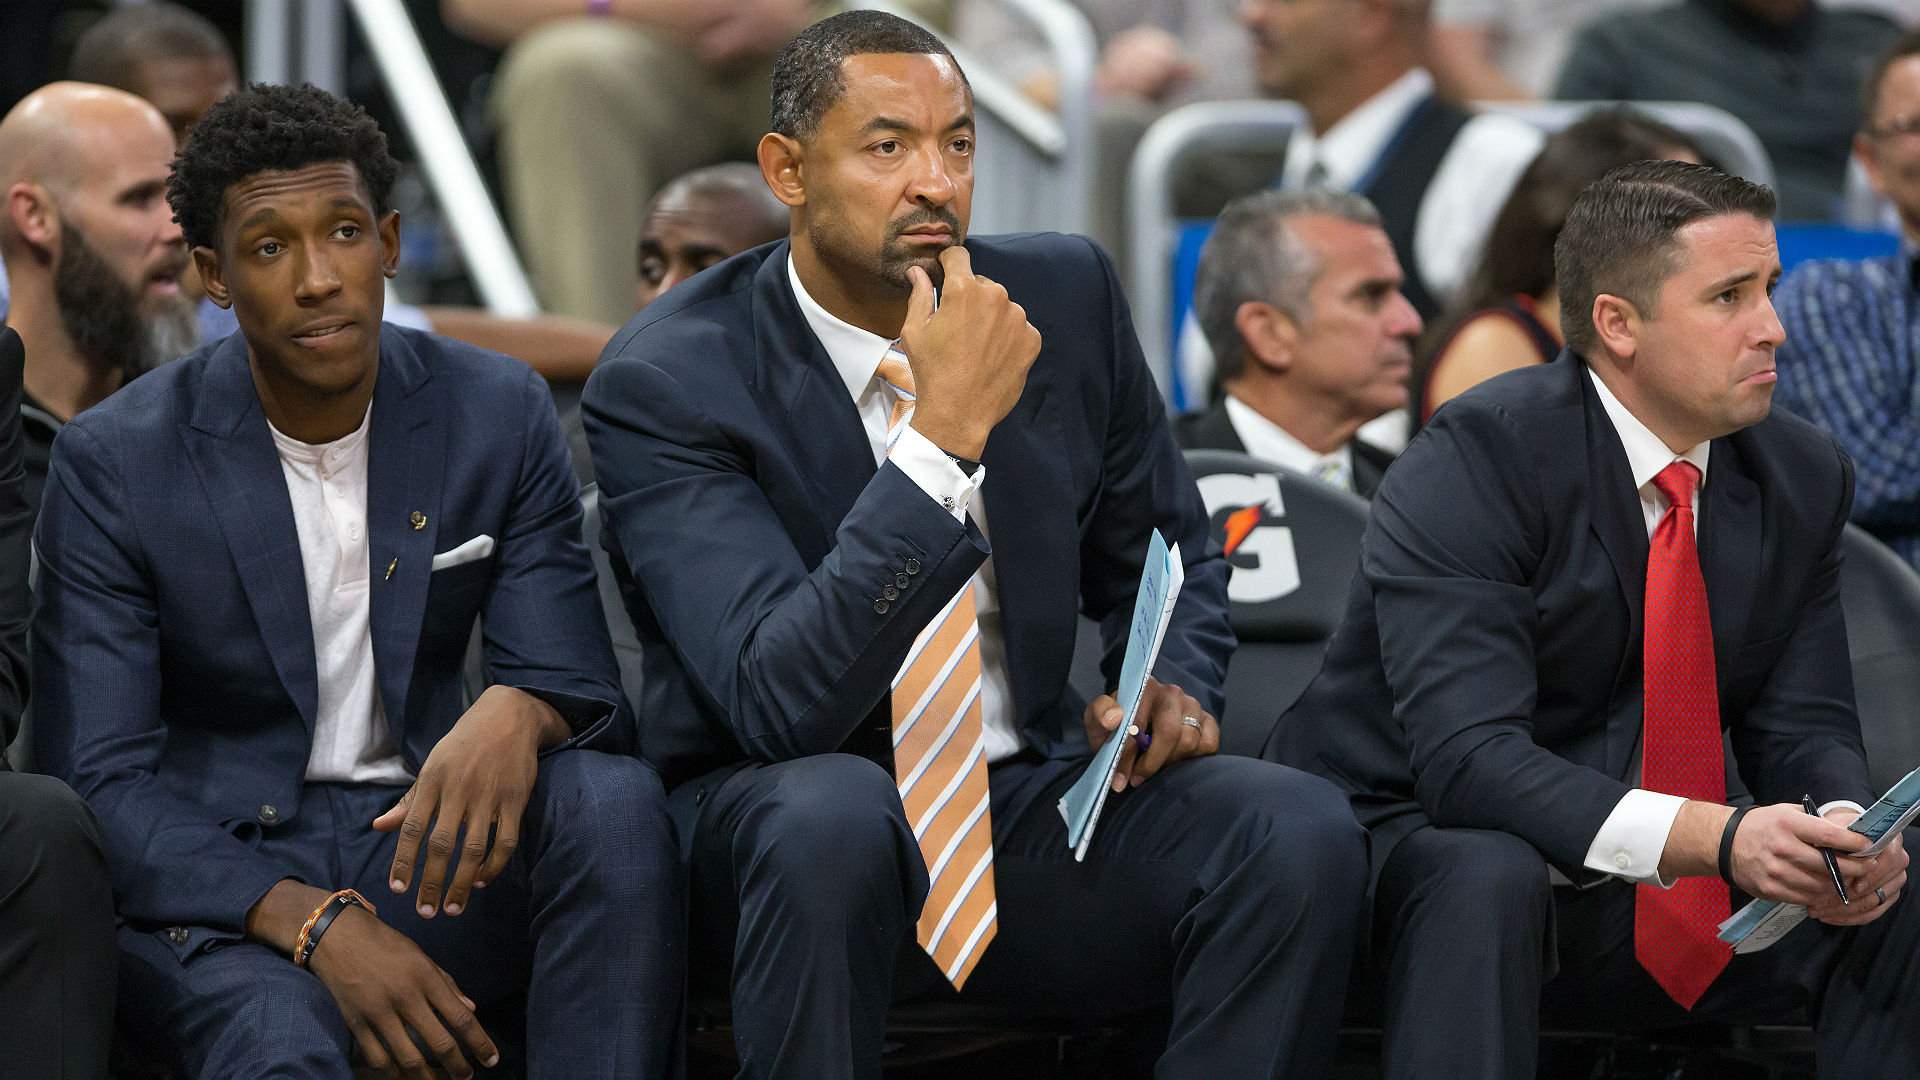 Michigan offers head coach job to 'Fab Five' alum Juwan Howard, report says